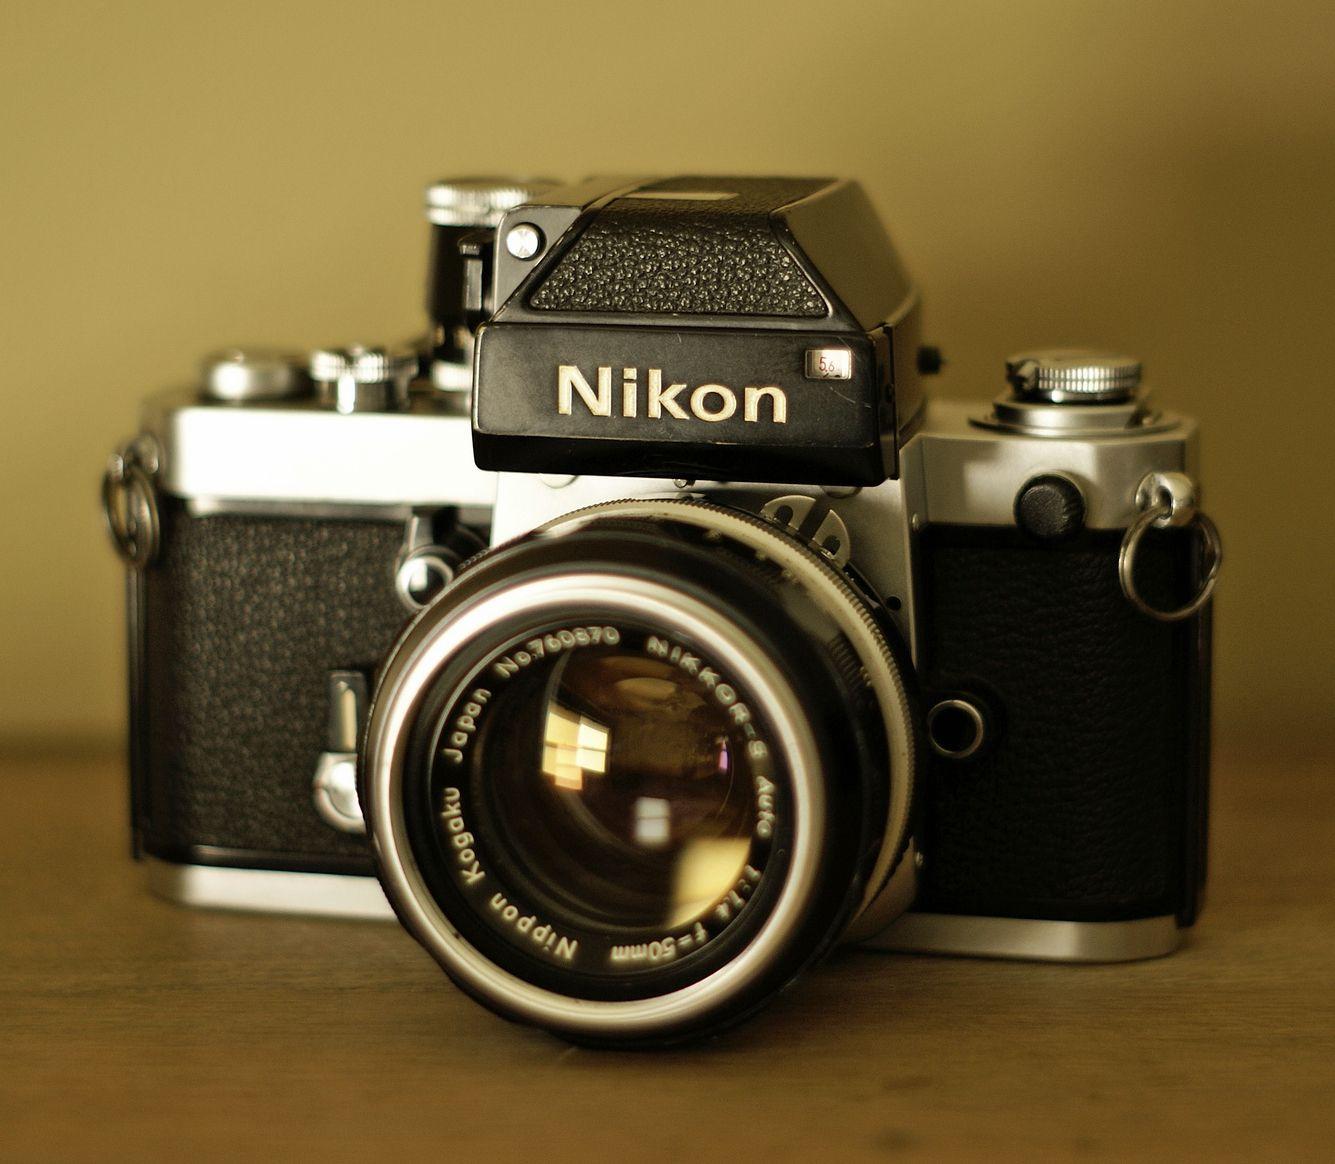 Nikon F2 Manual Ebook Printed Circuit Board Assembly For Lg Wm2487hwma Washing Machine Array S Rials Qui Donnent L U0027ann E De Fabrication Rh Pinterest